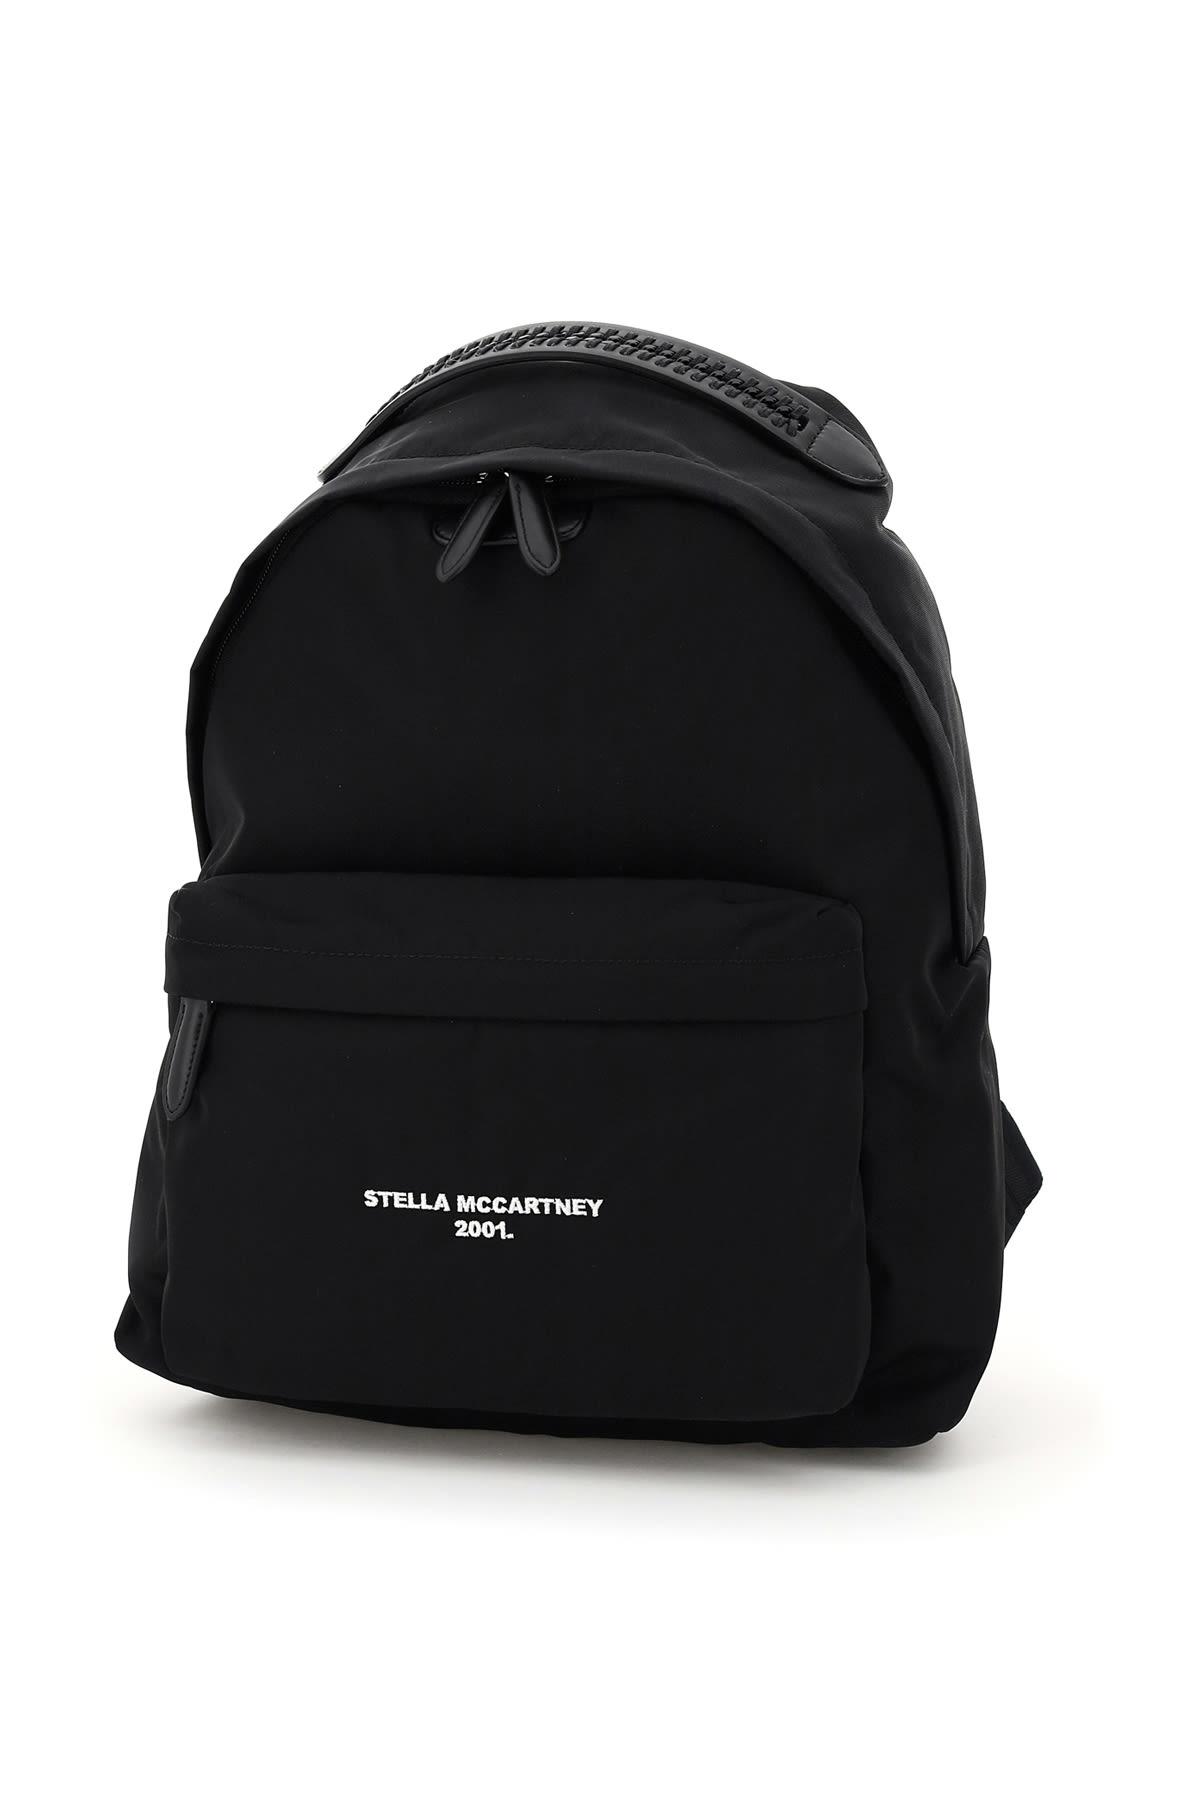 Stella McCartney Logo Go Nylon Backpack